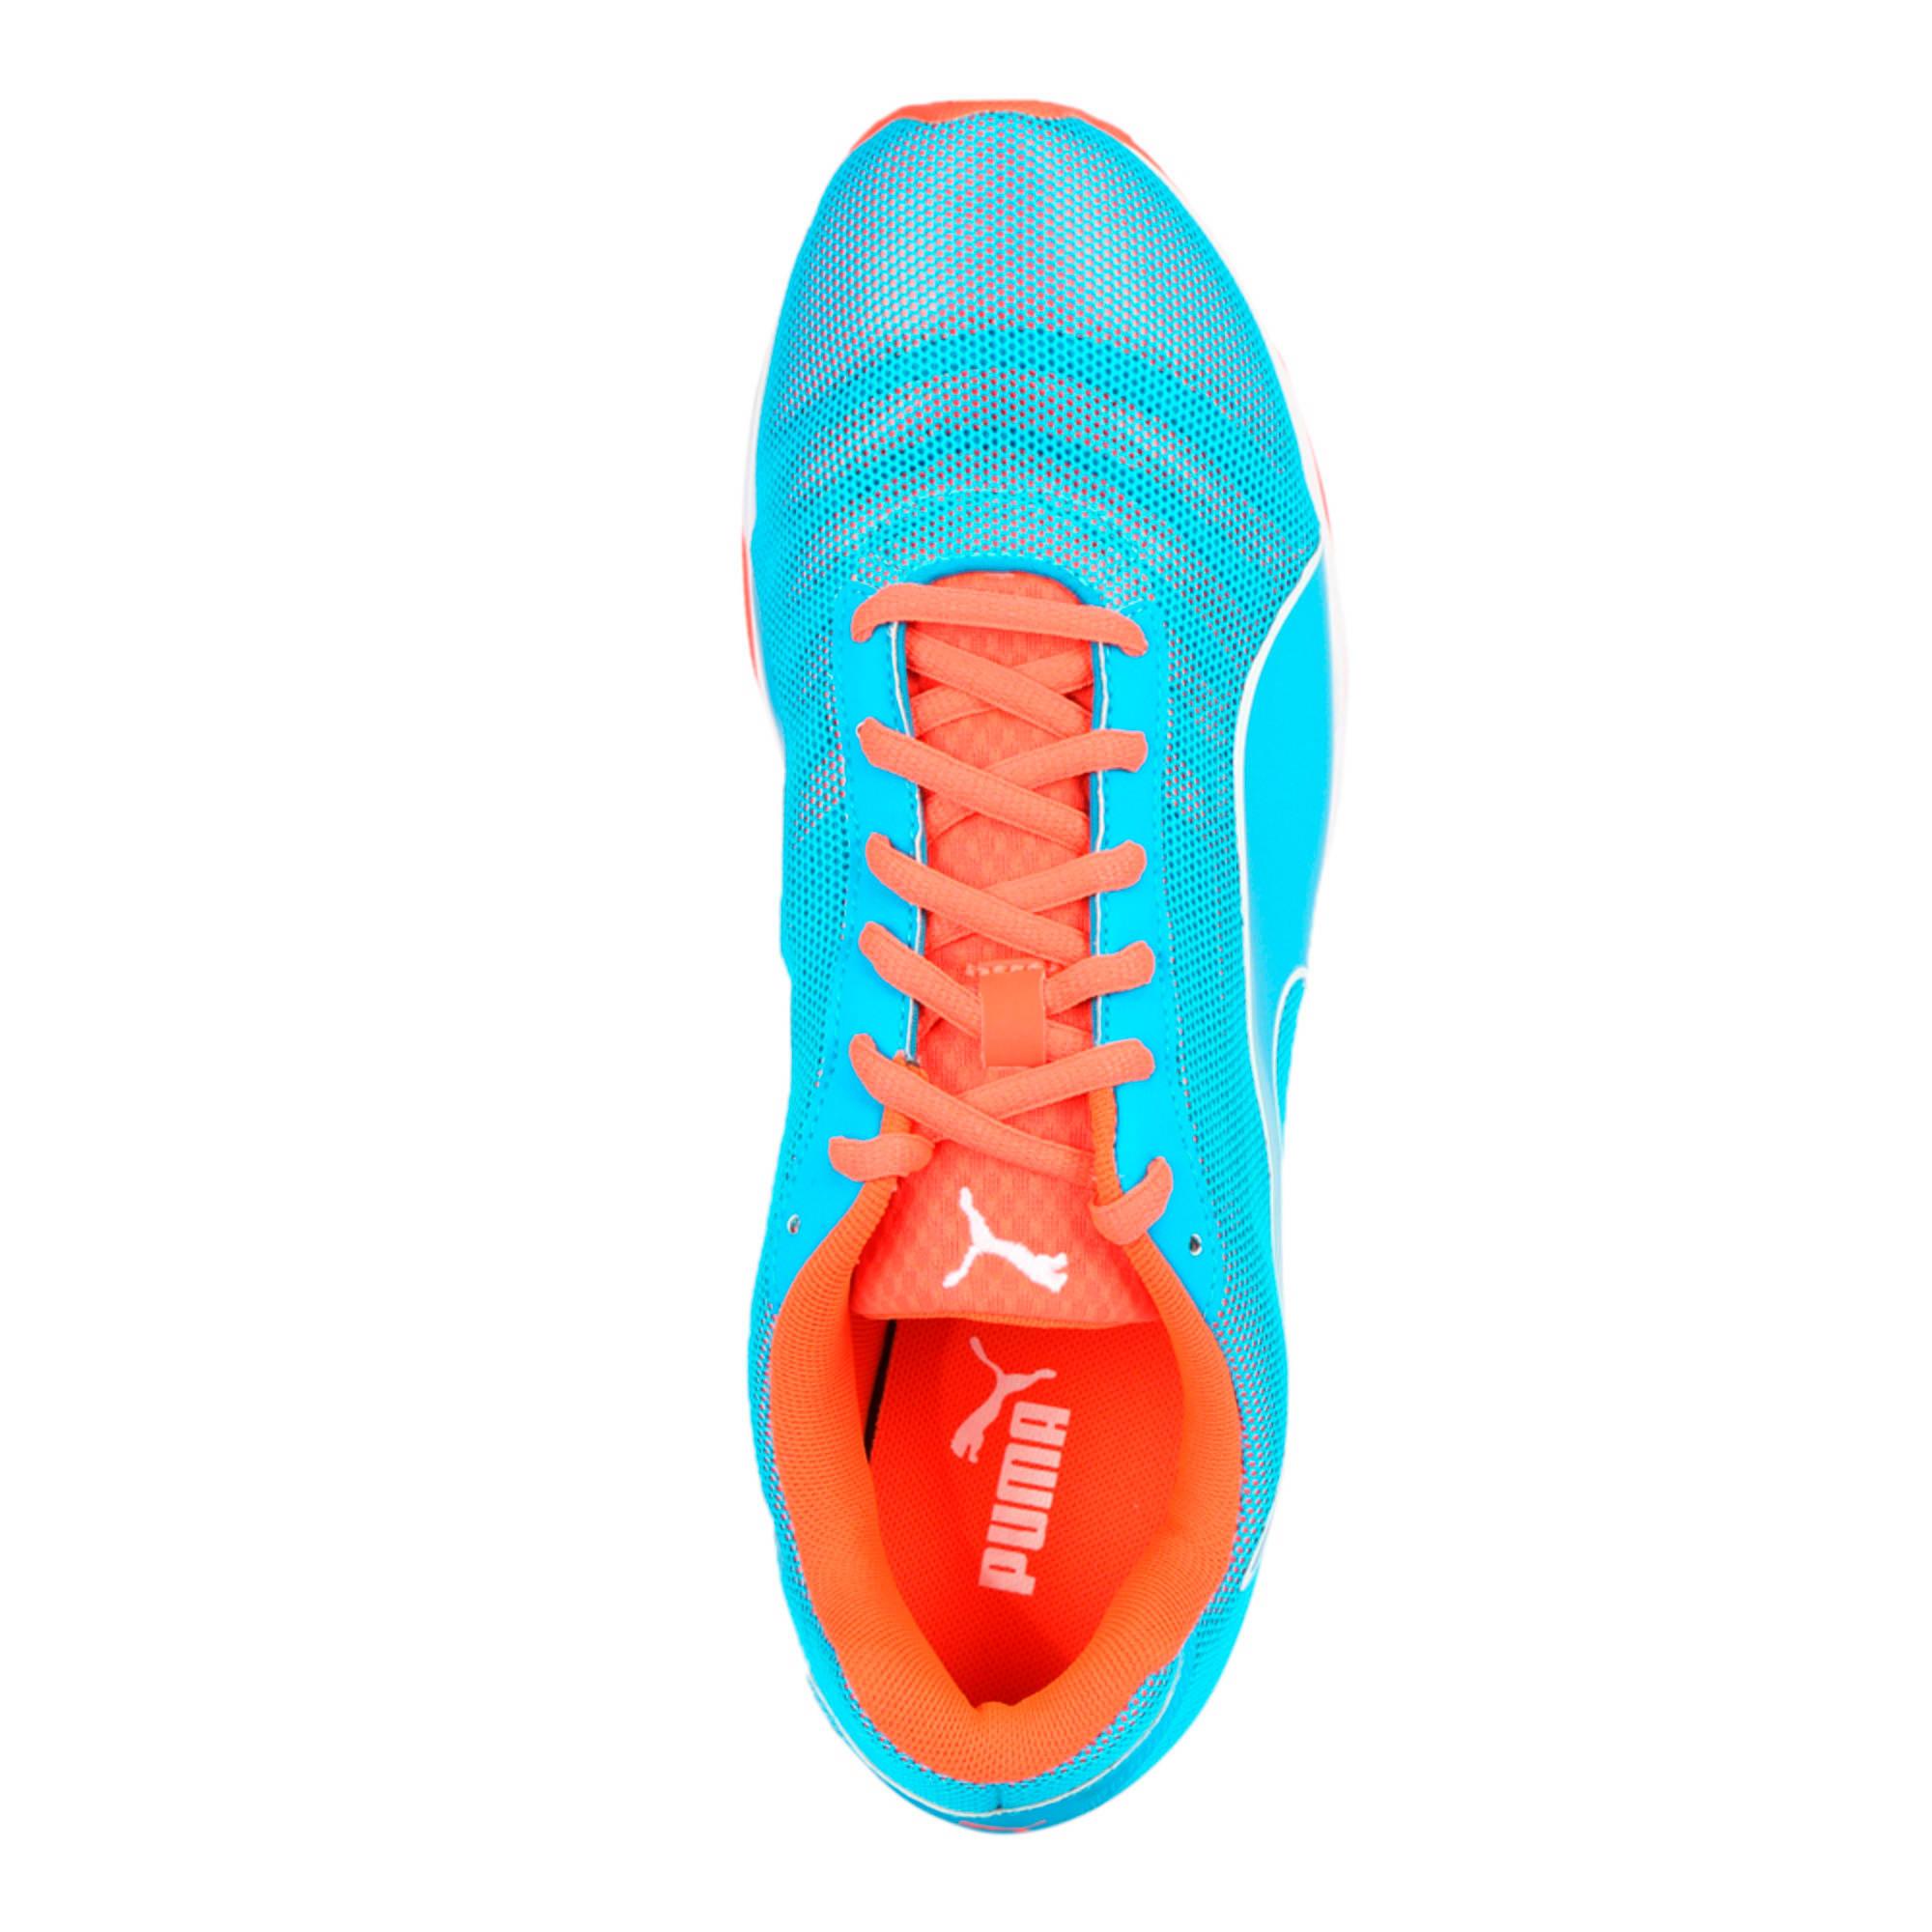 Thumbnail 3 of Burst Running Shoes, atomic blue-red blast, medium-IND